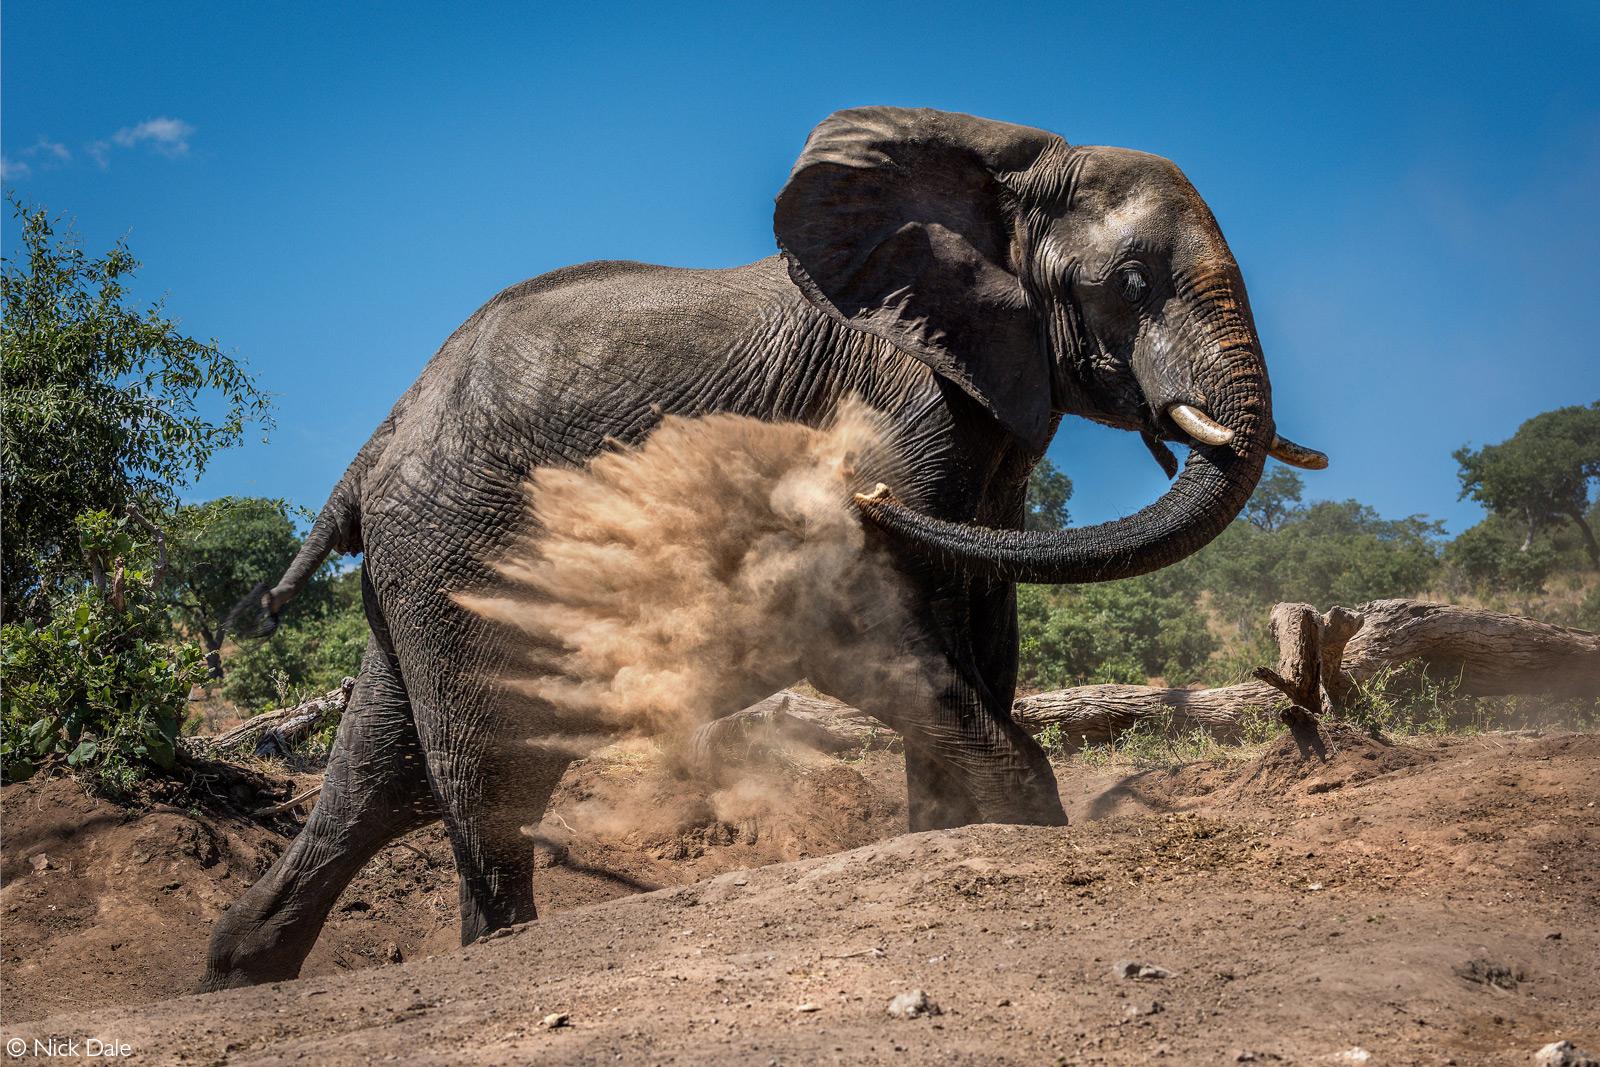 An elephant takes a dust bath. Chobe National Park, Botswana © Nick Dale